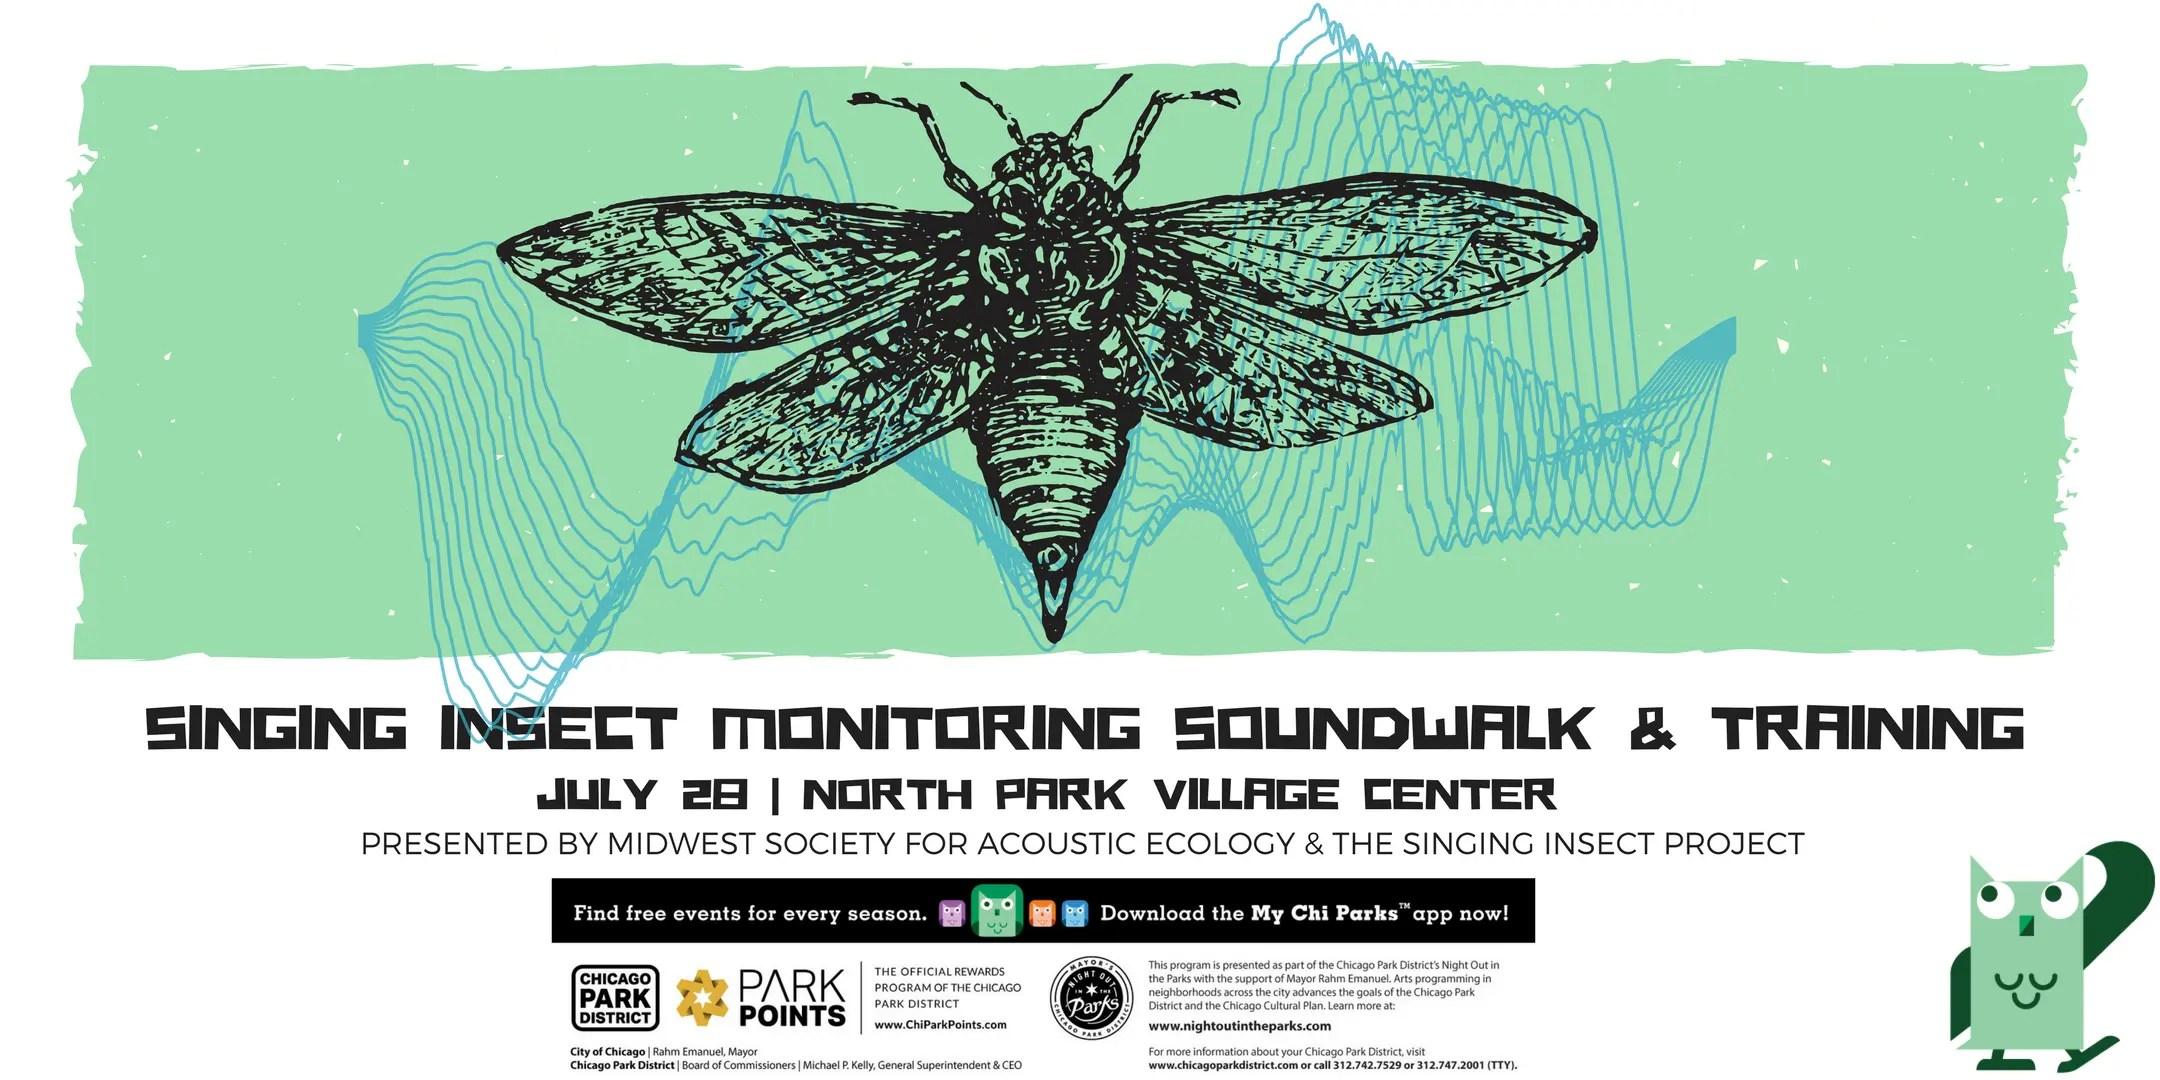 Singing Insect Monitoring Soundwalk & Training – Fri., July 28